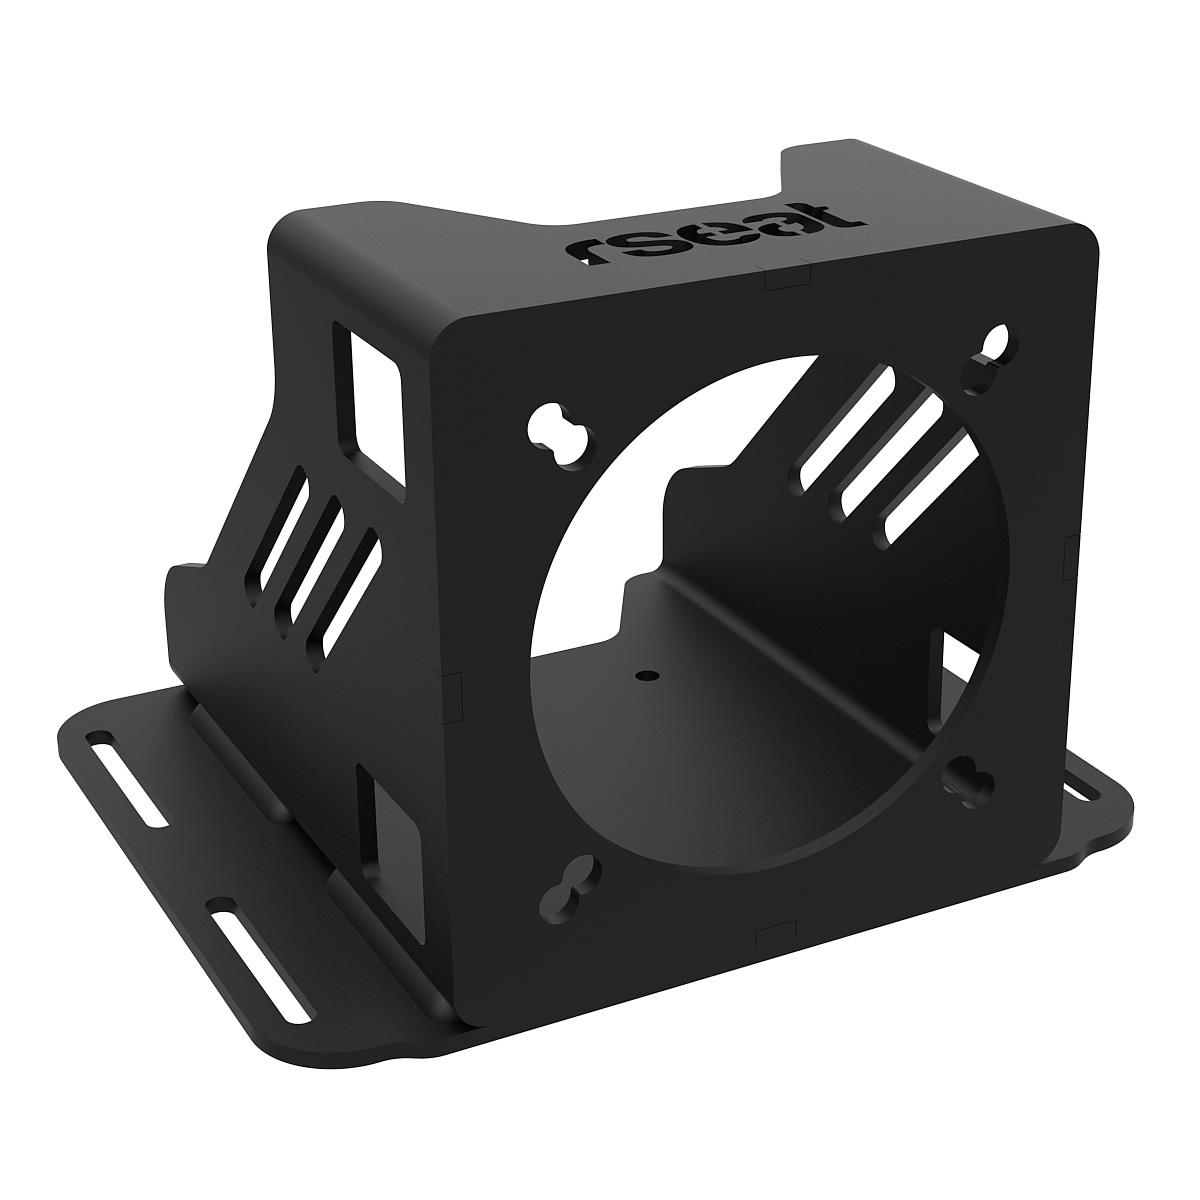 SIMUCUBE 1, 2 Sport/Pro/Ultimate, Mige mount Black